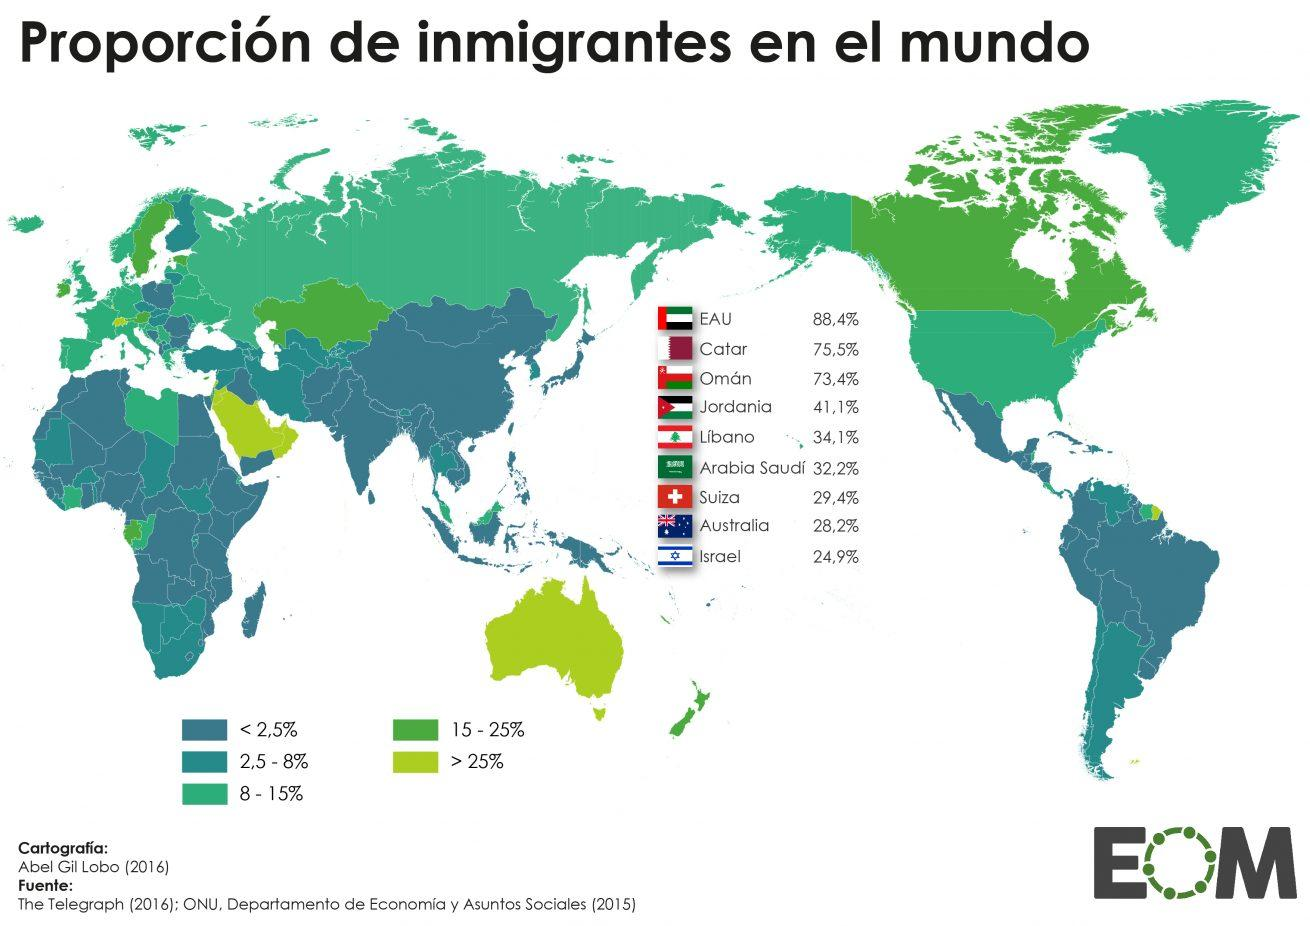 https://elordenmundial.com/wp-content/uploads/2018/05/Mundo-Poblaci%C3%B3n-Inmigraci%C3%B3n-Mapa-01-1310x926.jpg